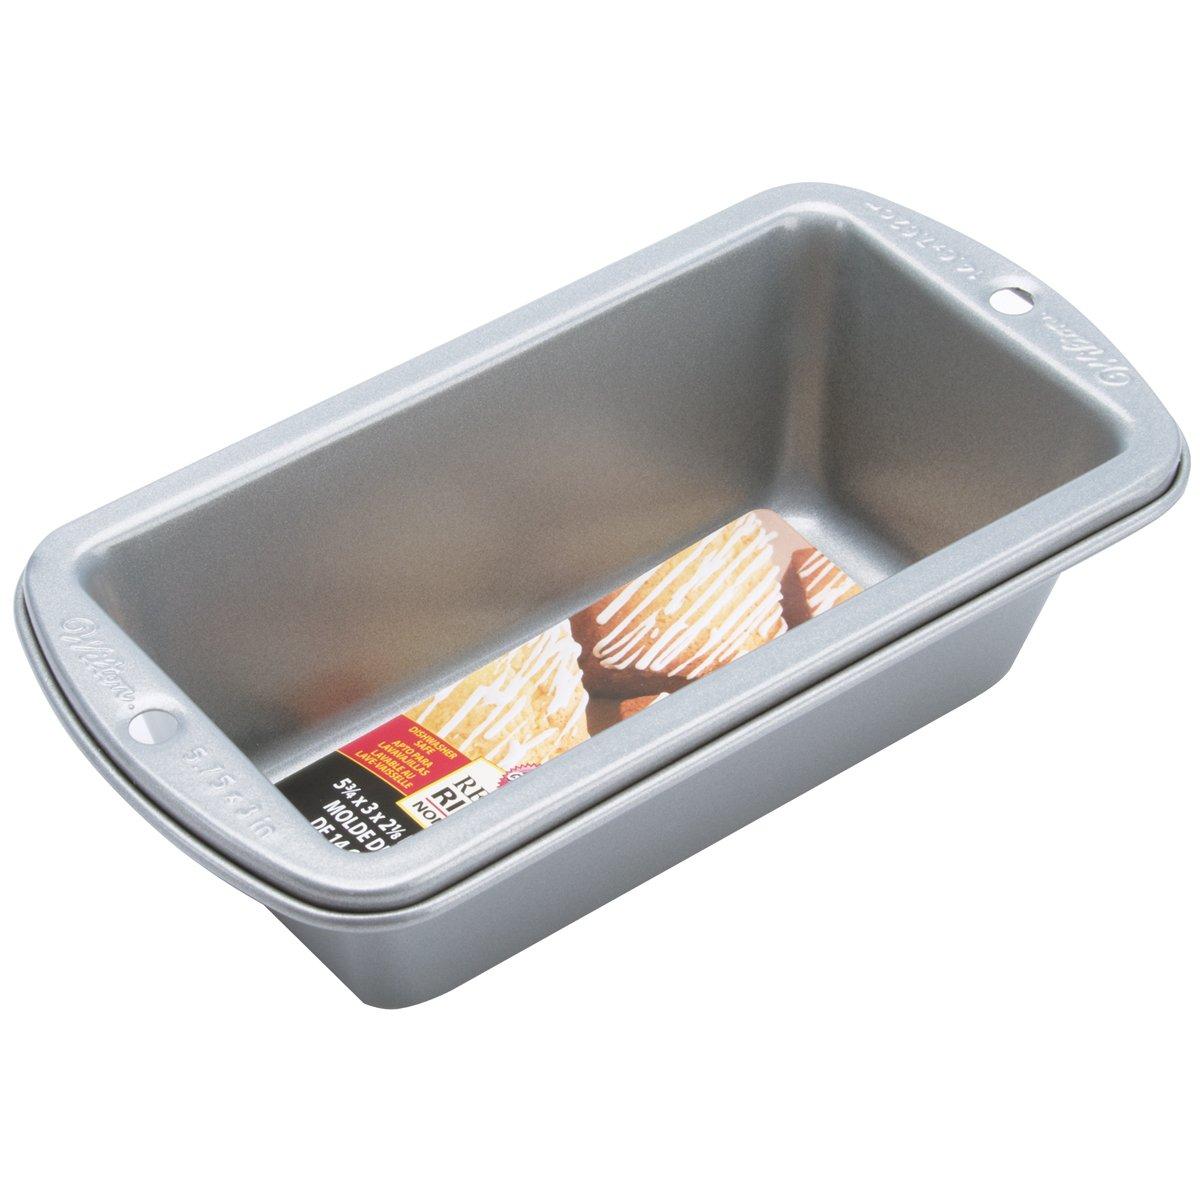 Wilton 14.6 x 7.6 cm (5.75 x 3-Inch) Recipe Right Mini Loaf Tin 2105-949